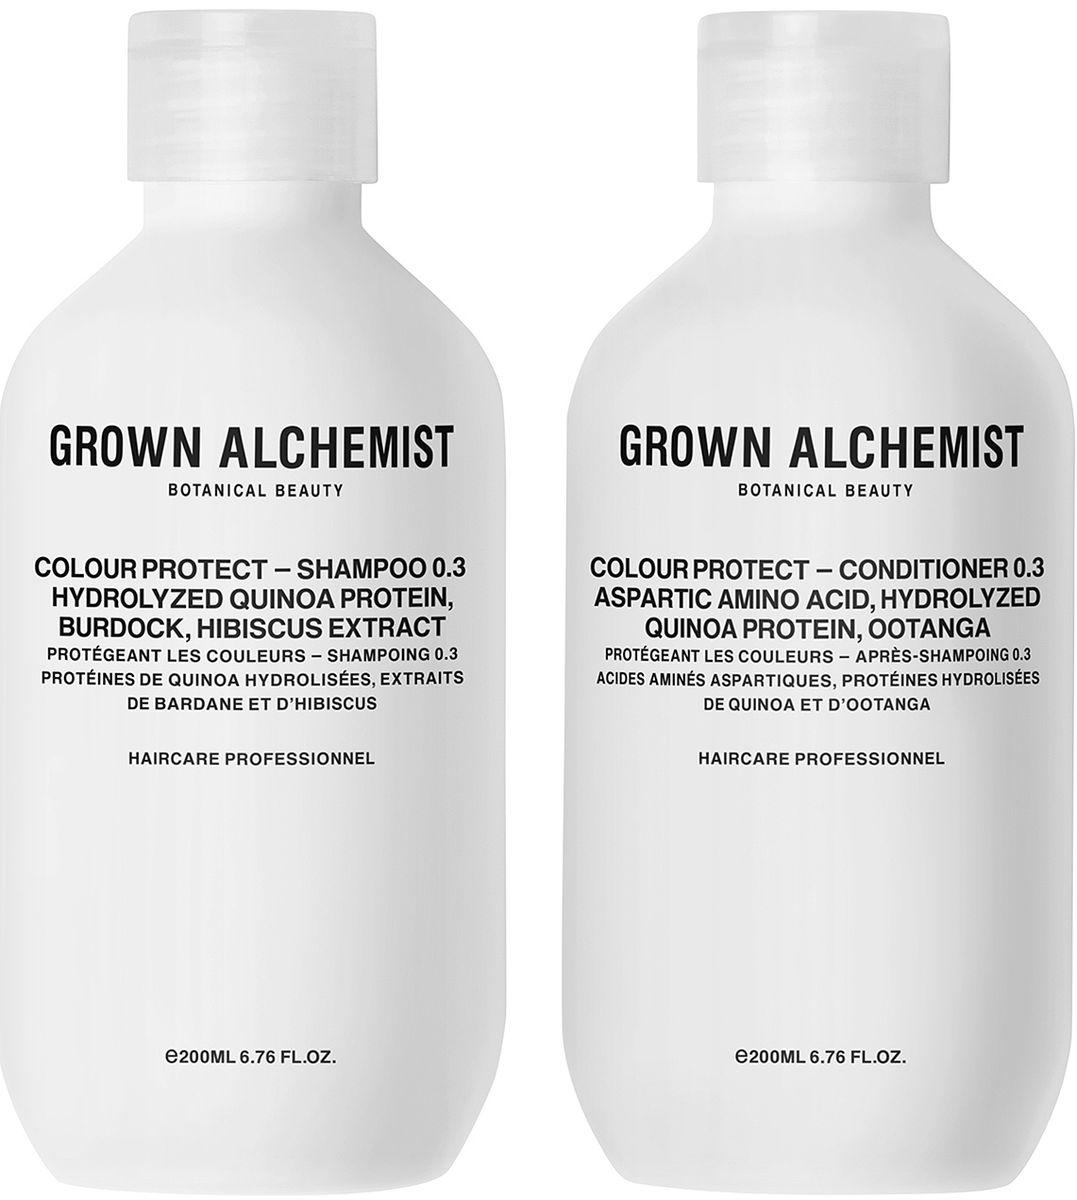 Grown Alchemist Набор для окрашенных волос: кондиционер, шампунь, 2 х 200 мл - Наборы